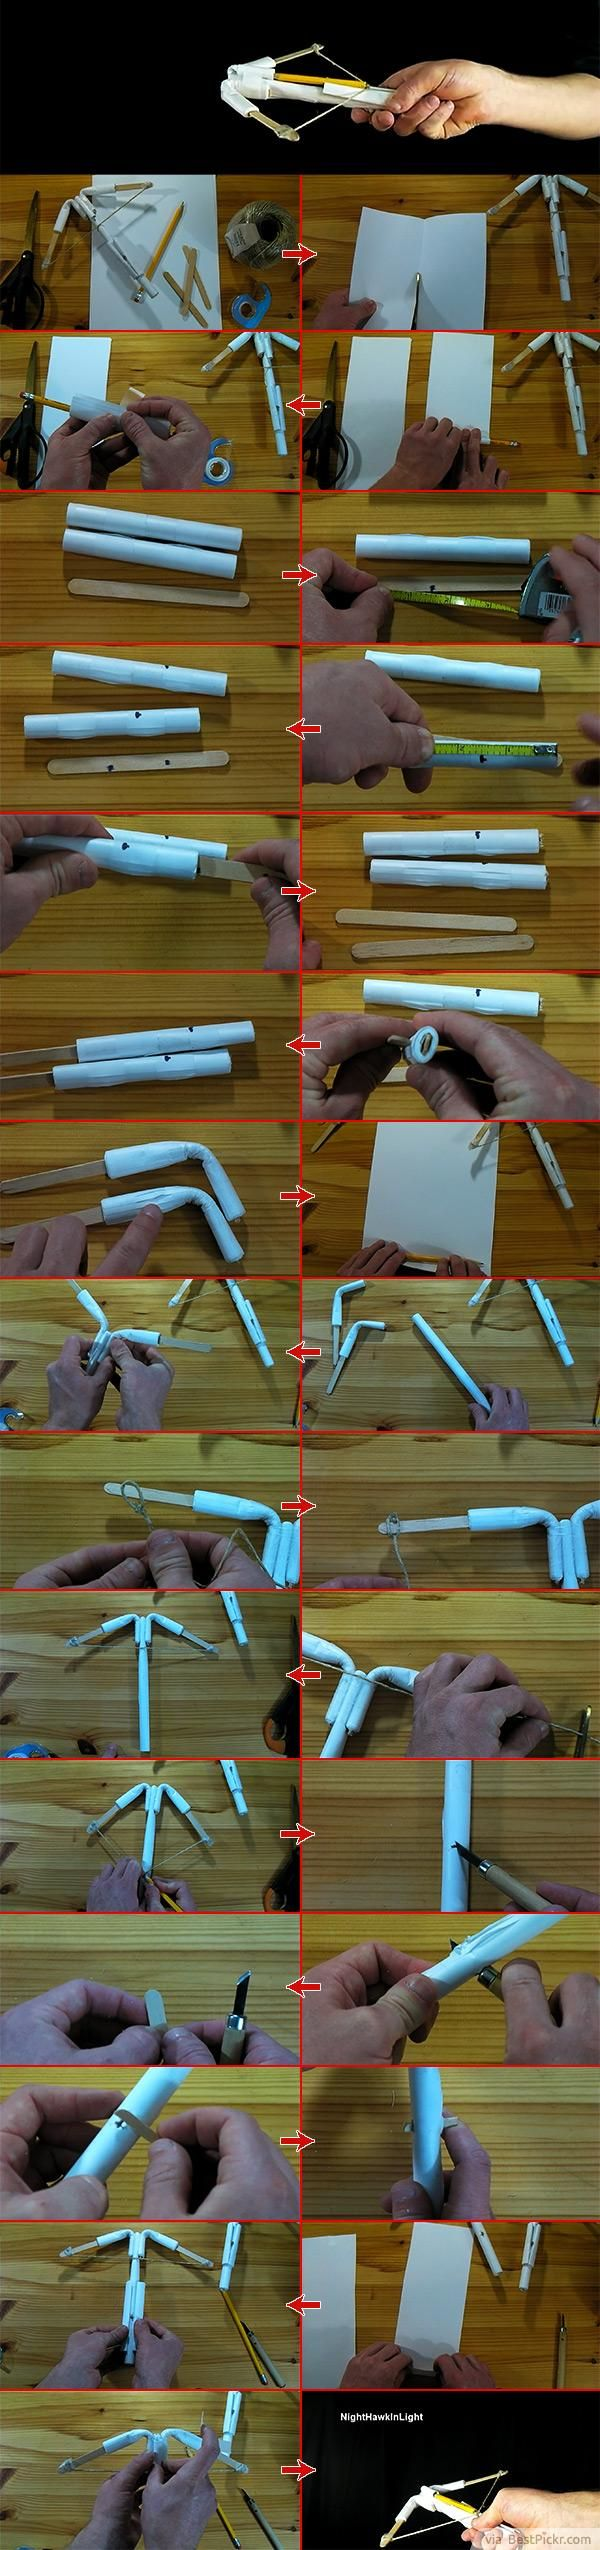 homemade-mini-toy-crossbow